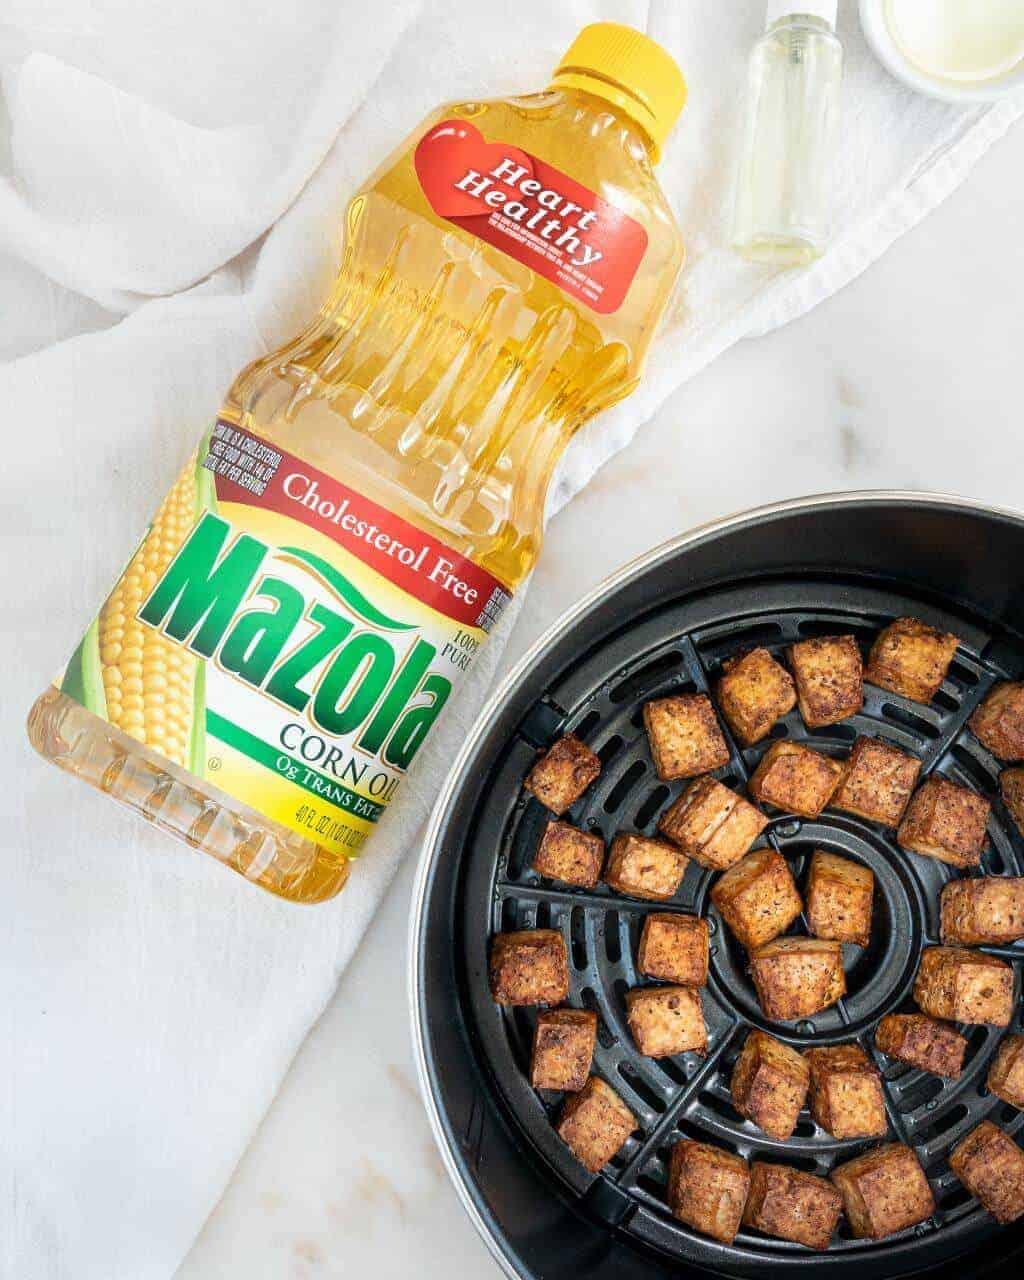 Bottle of Mazola Oil and Crispy Tofu inside an Air Fryer